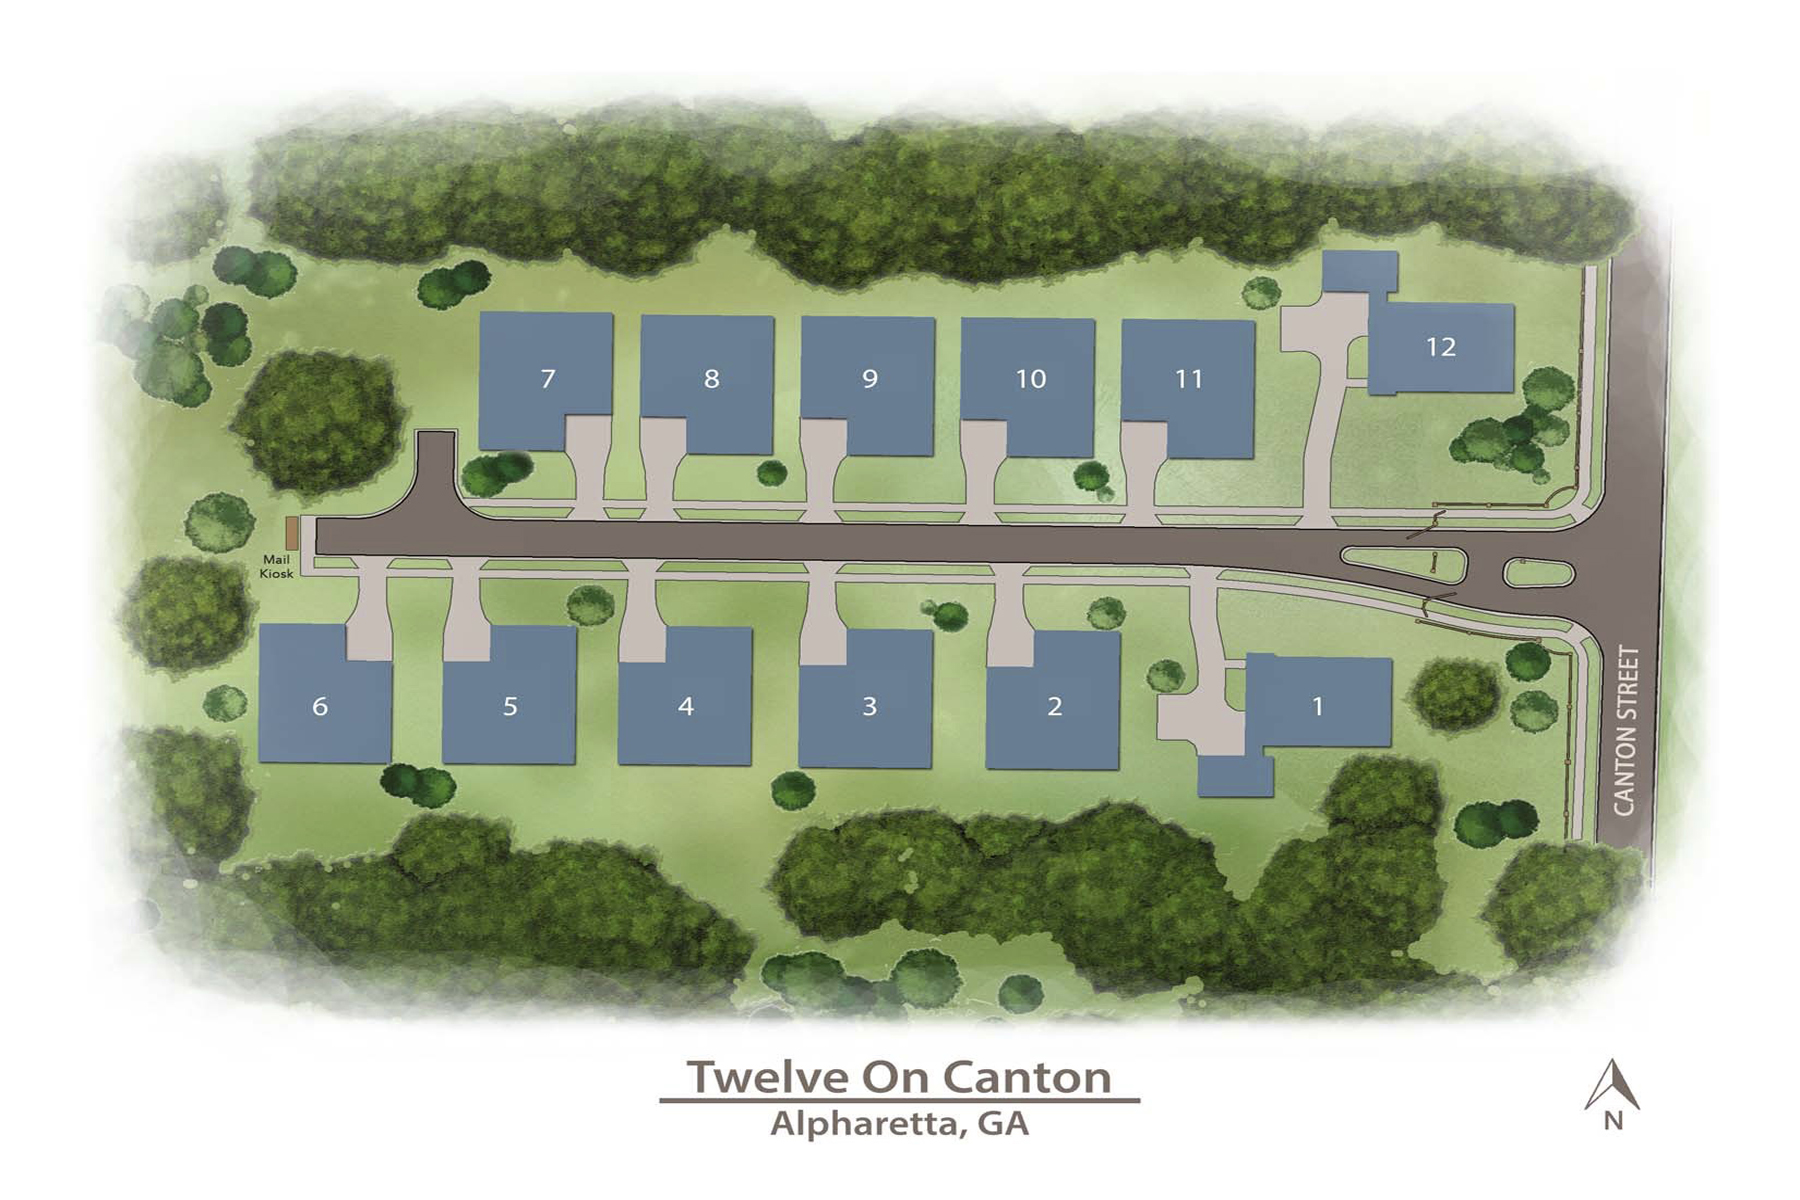 Single Family Home for Sale at Premier Gated Community in Alpharetta's Garden District 2155 Canton Vw Alpharetta, Georgia 30009 United States